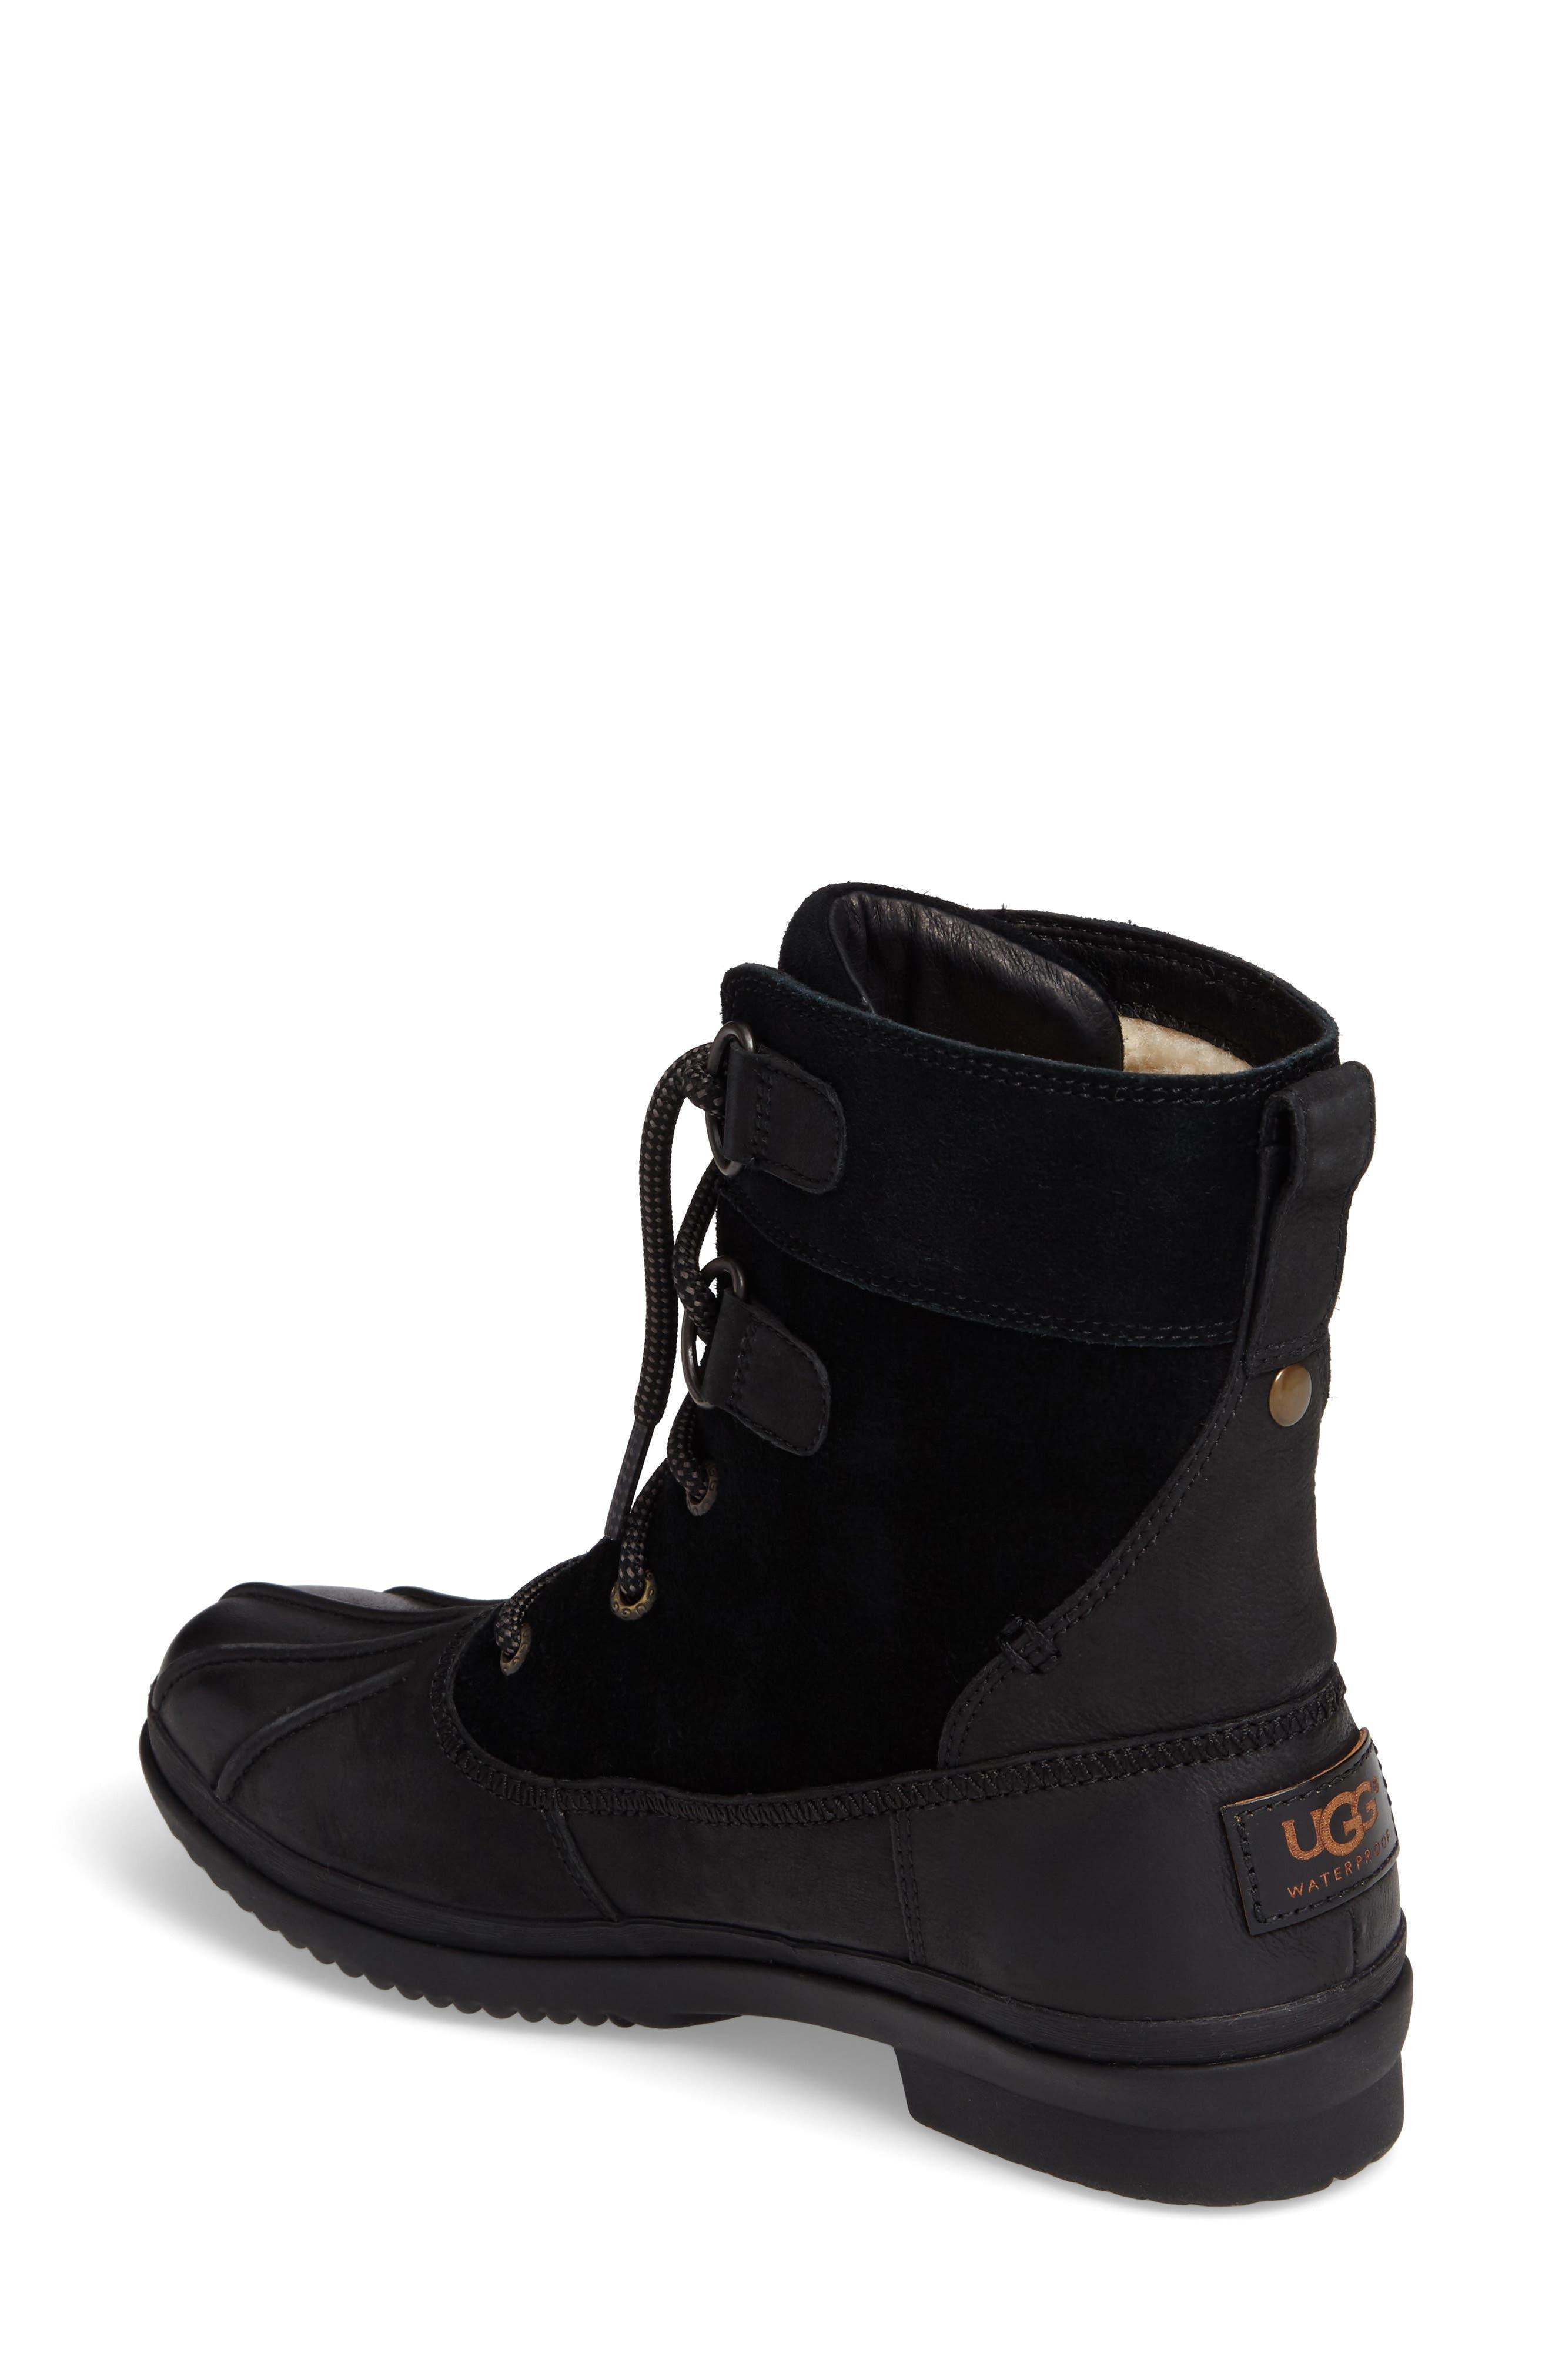 Azaria Waterproof Boot,                             Alternate thumbnail 2, color,                             001